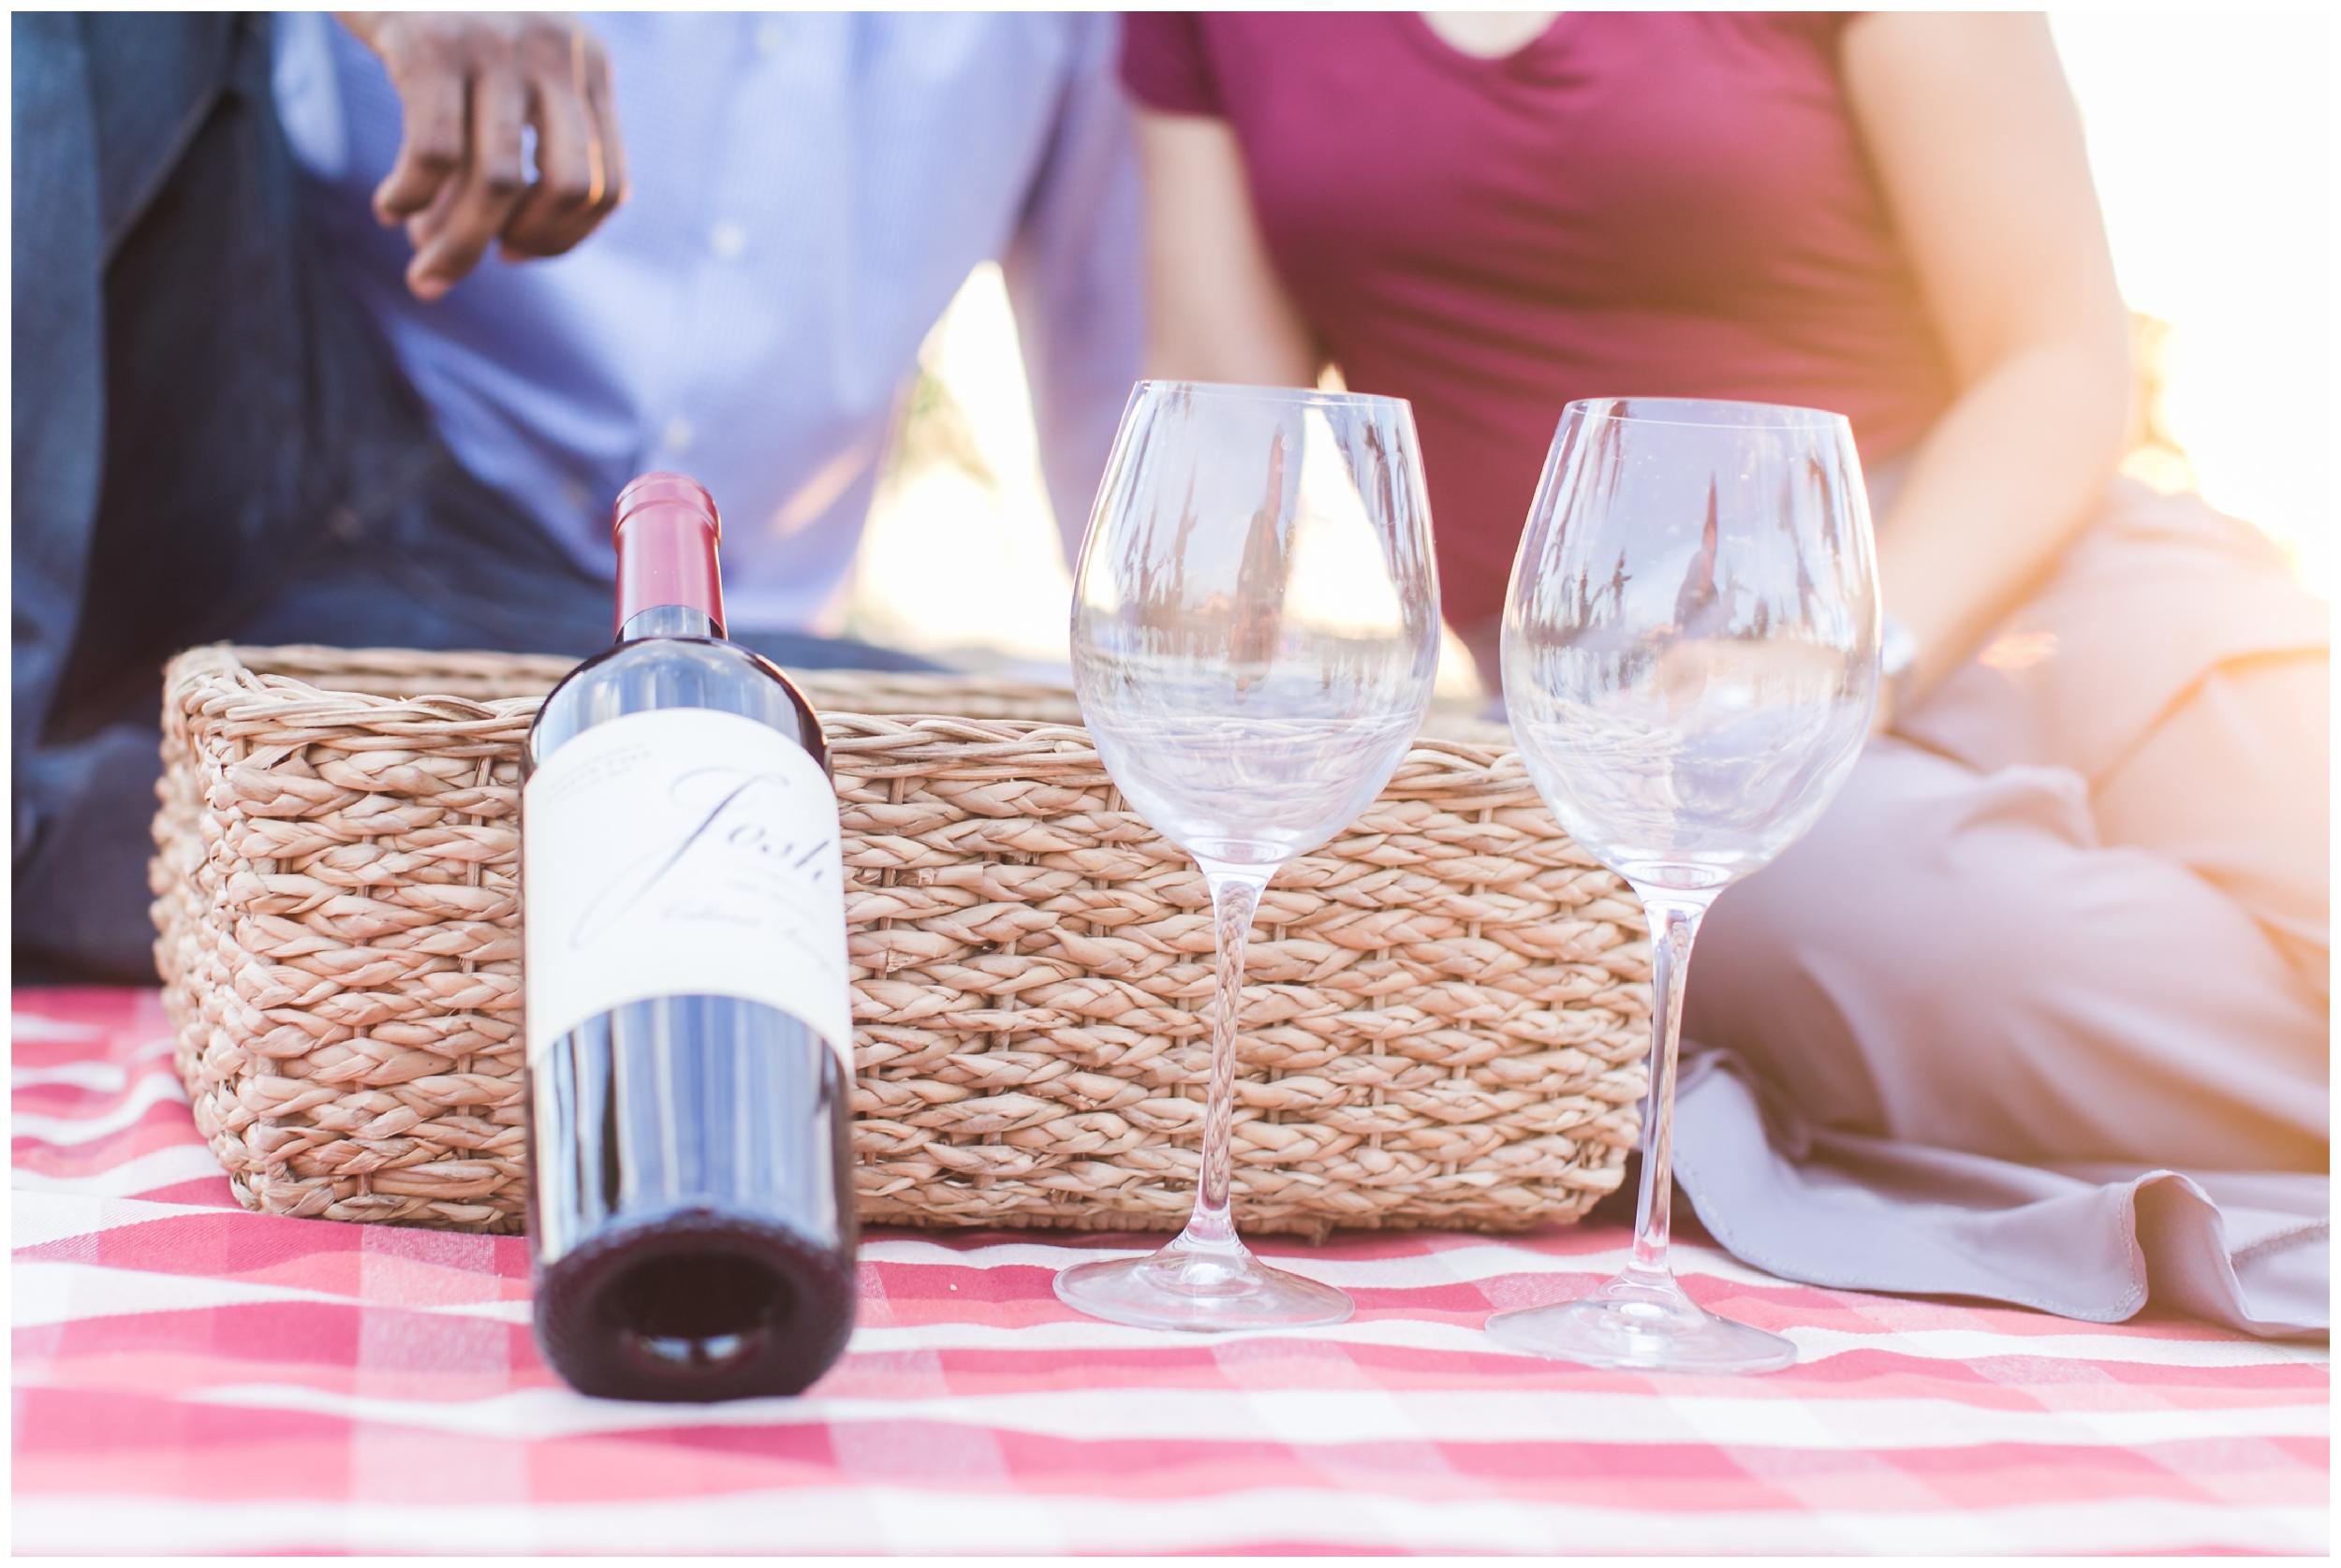 temecula-winery-engagement-wedding-photographer-carrie-vines0016.jpg